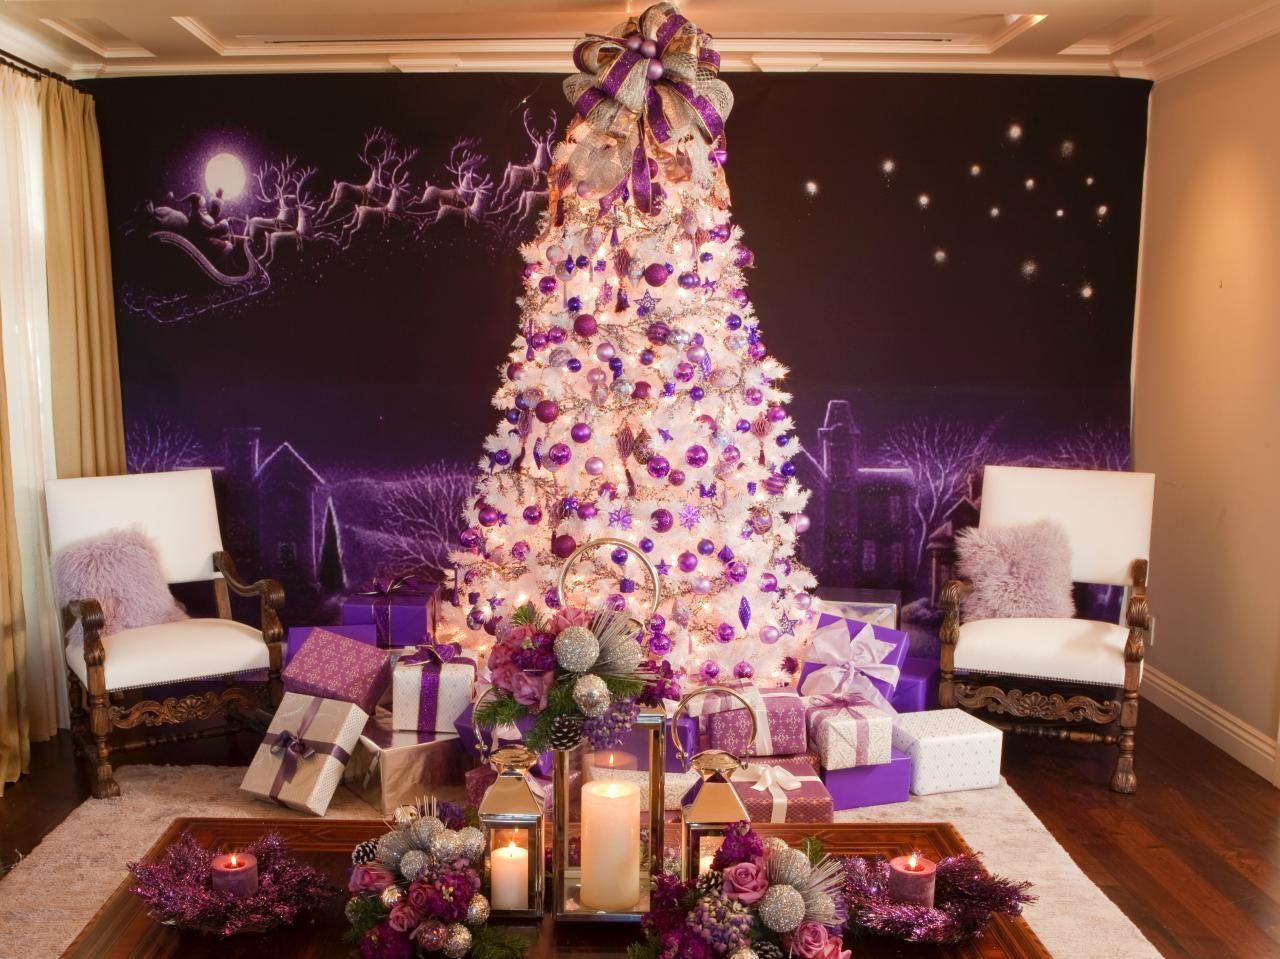 Christmas tree decorations purple - Retro Inspired Purple And White Christmas Decorations